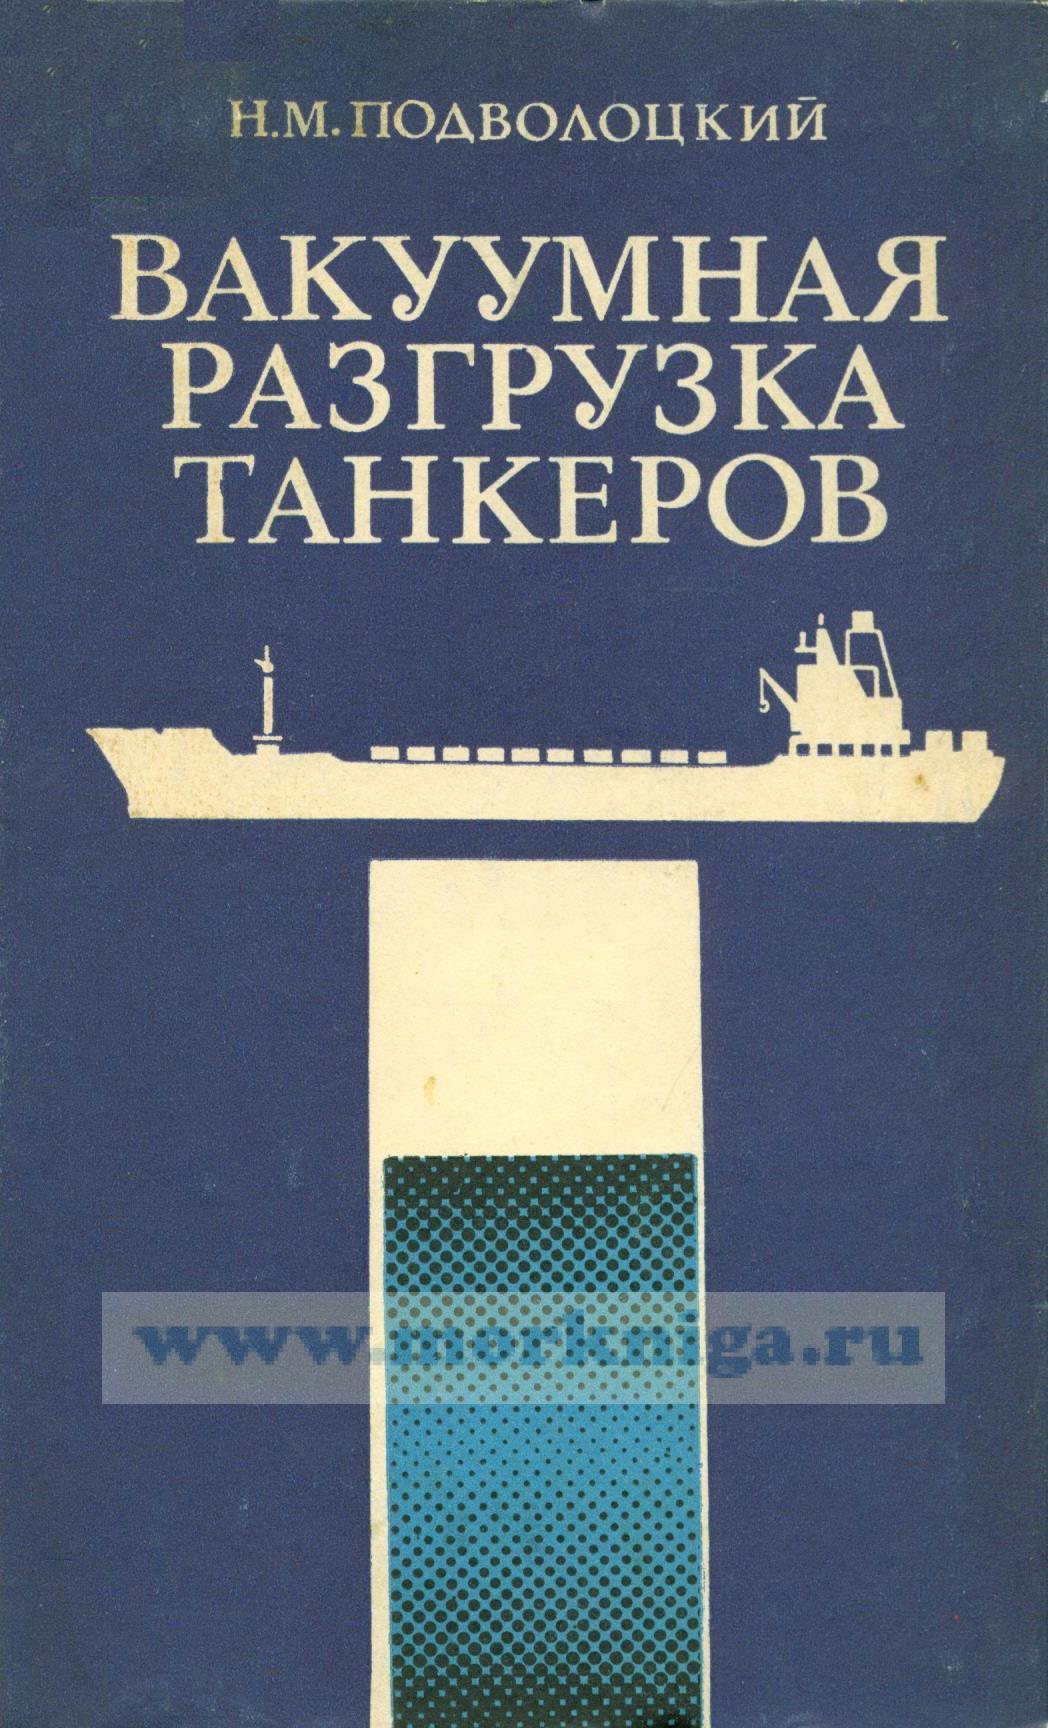 Вакуумная разгрузка танкеров